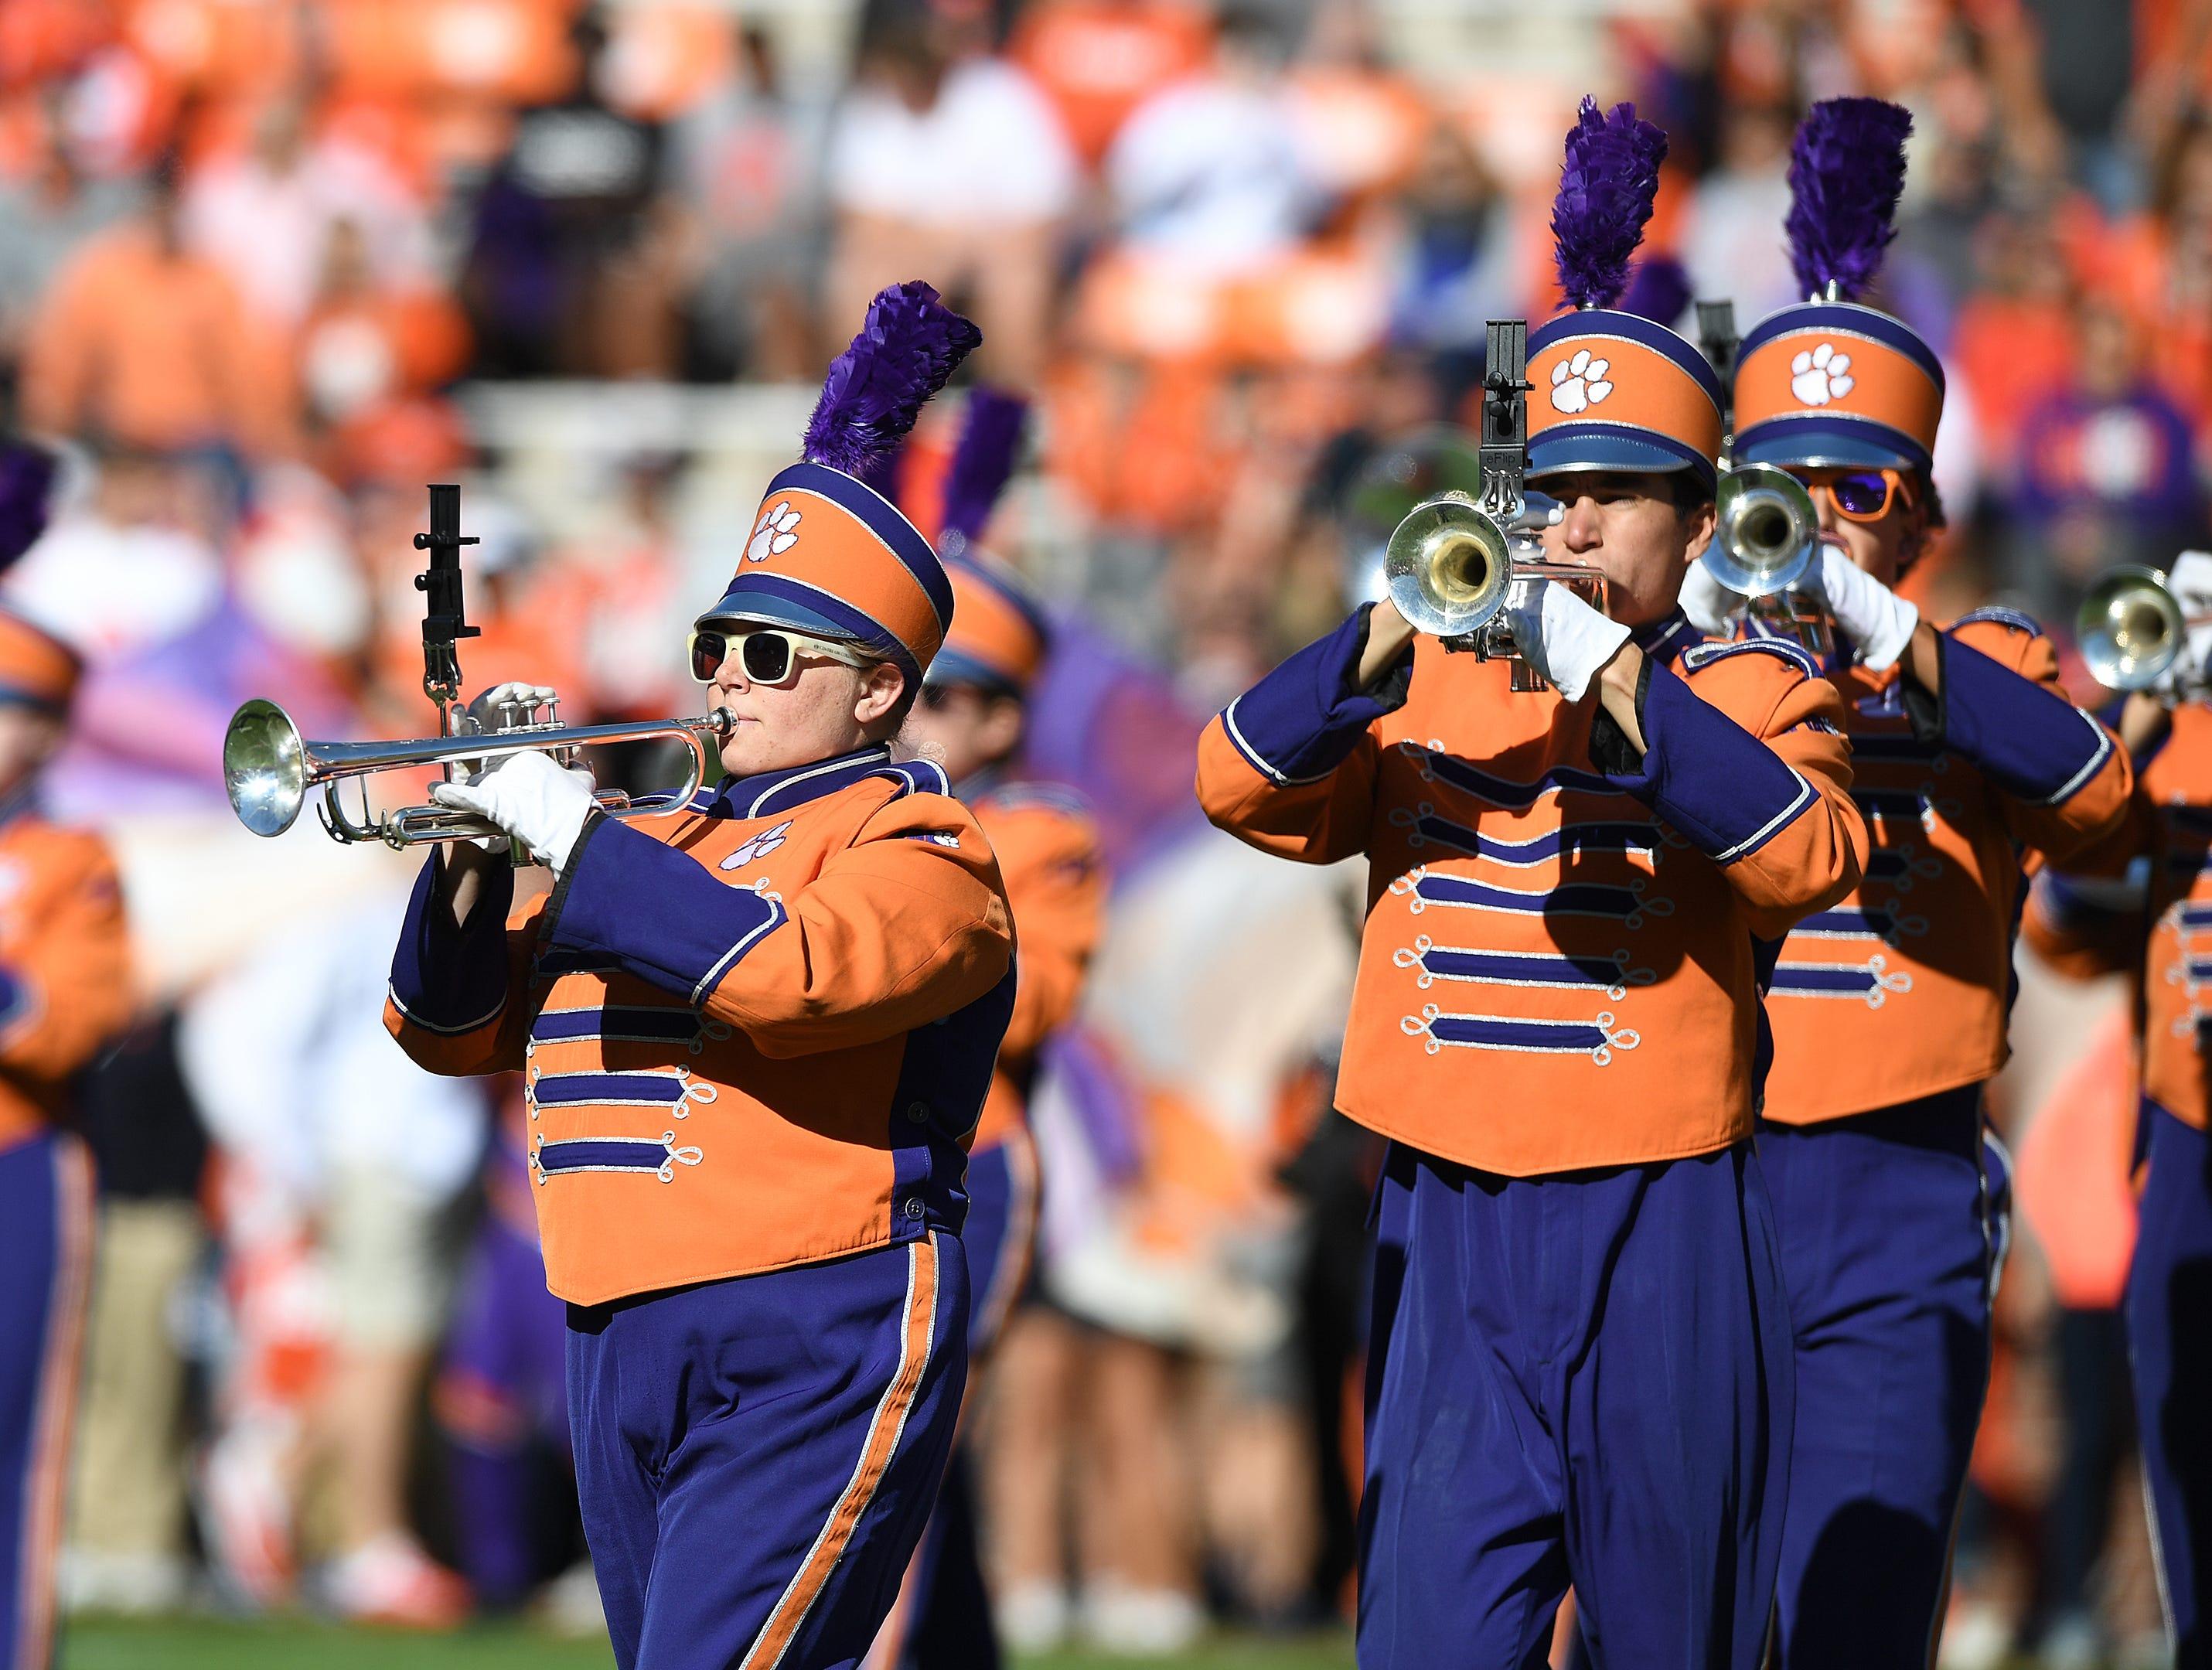 Clemson's band during pregame Saturday, November 3, 2018 at Clemson's Memorial Stadium.